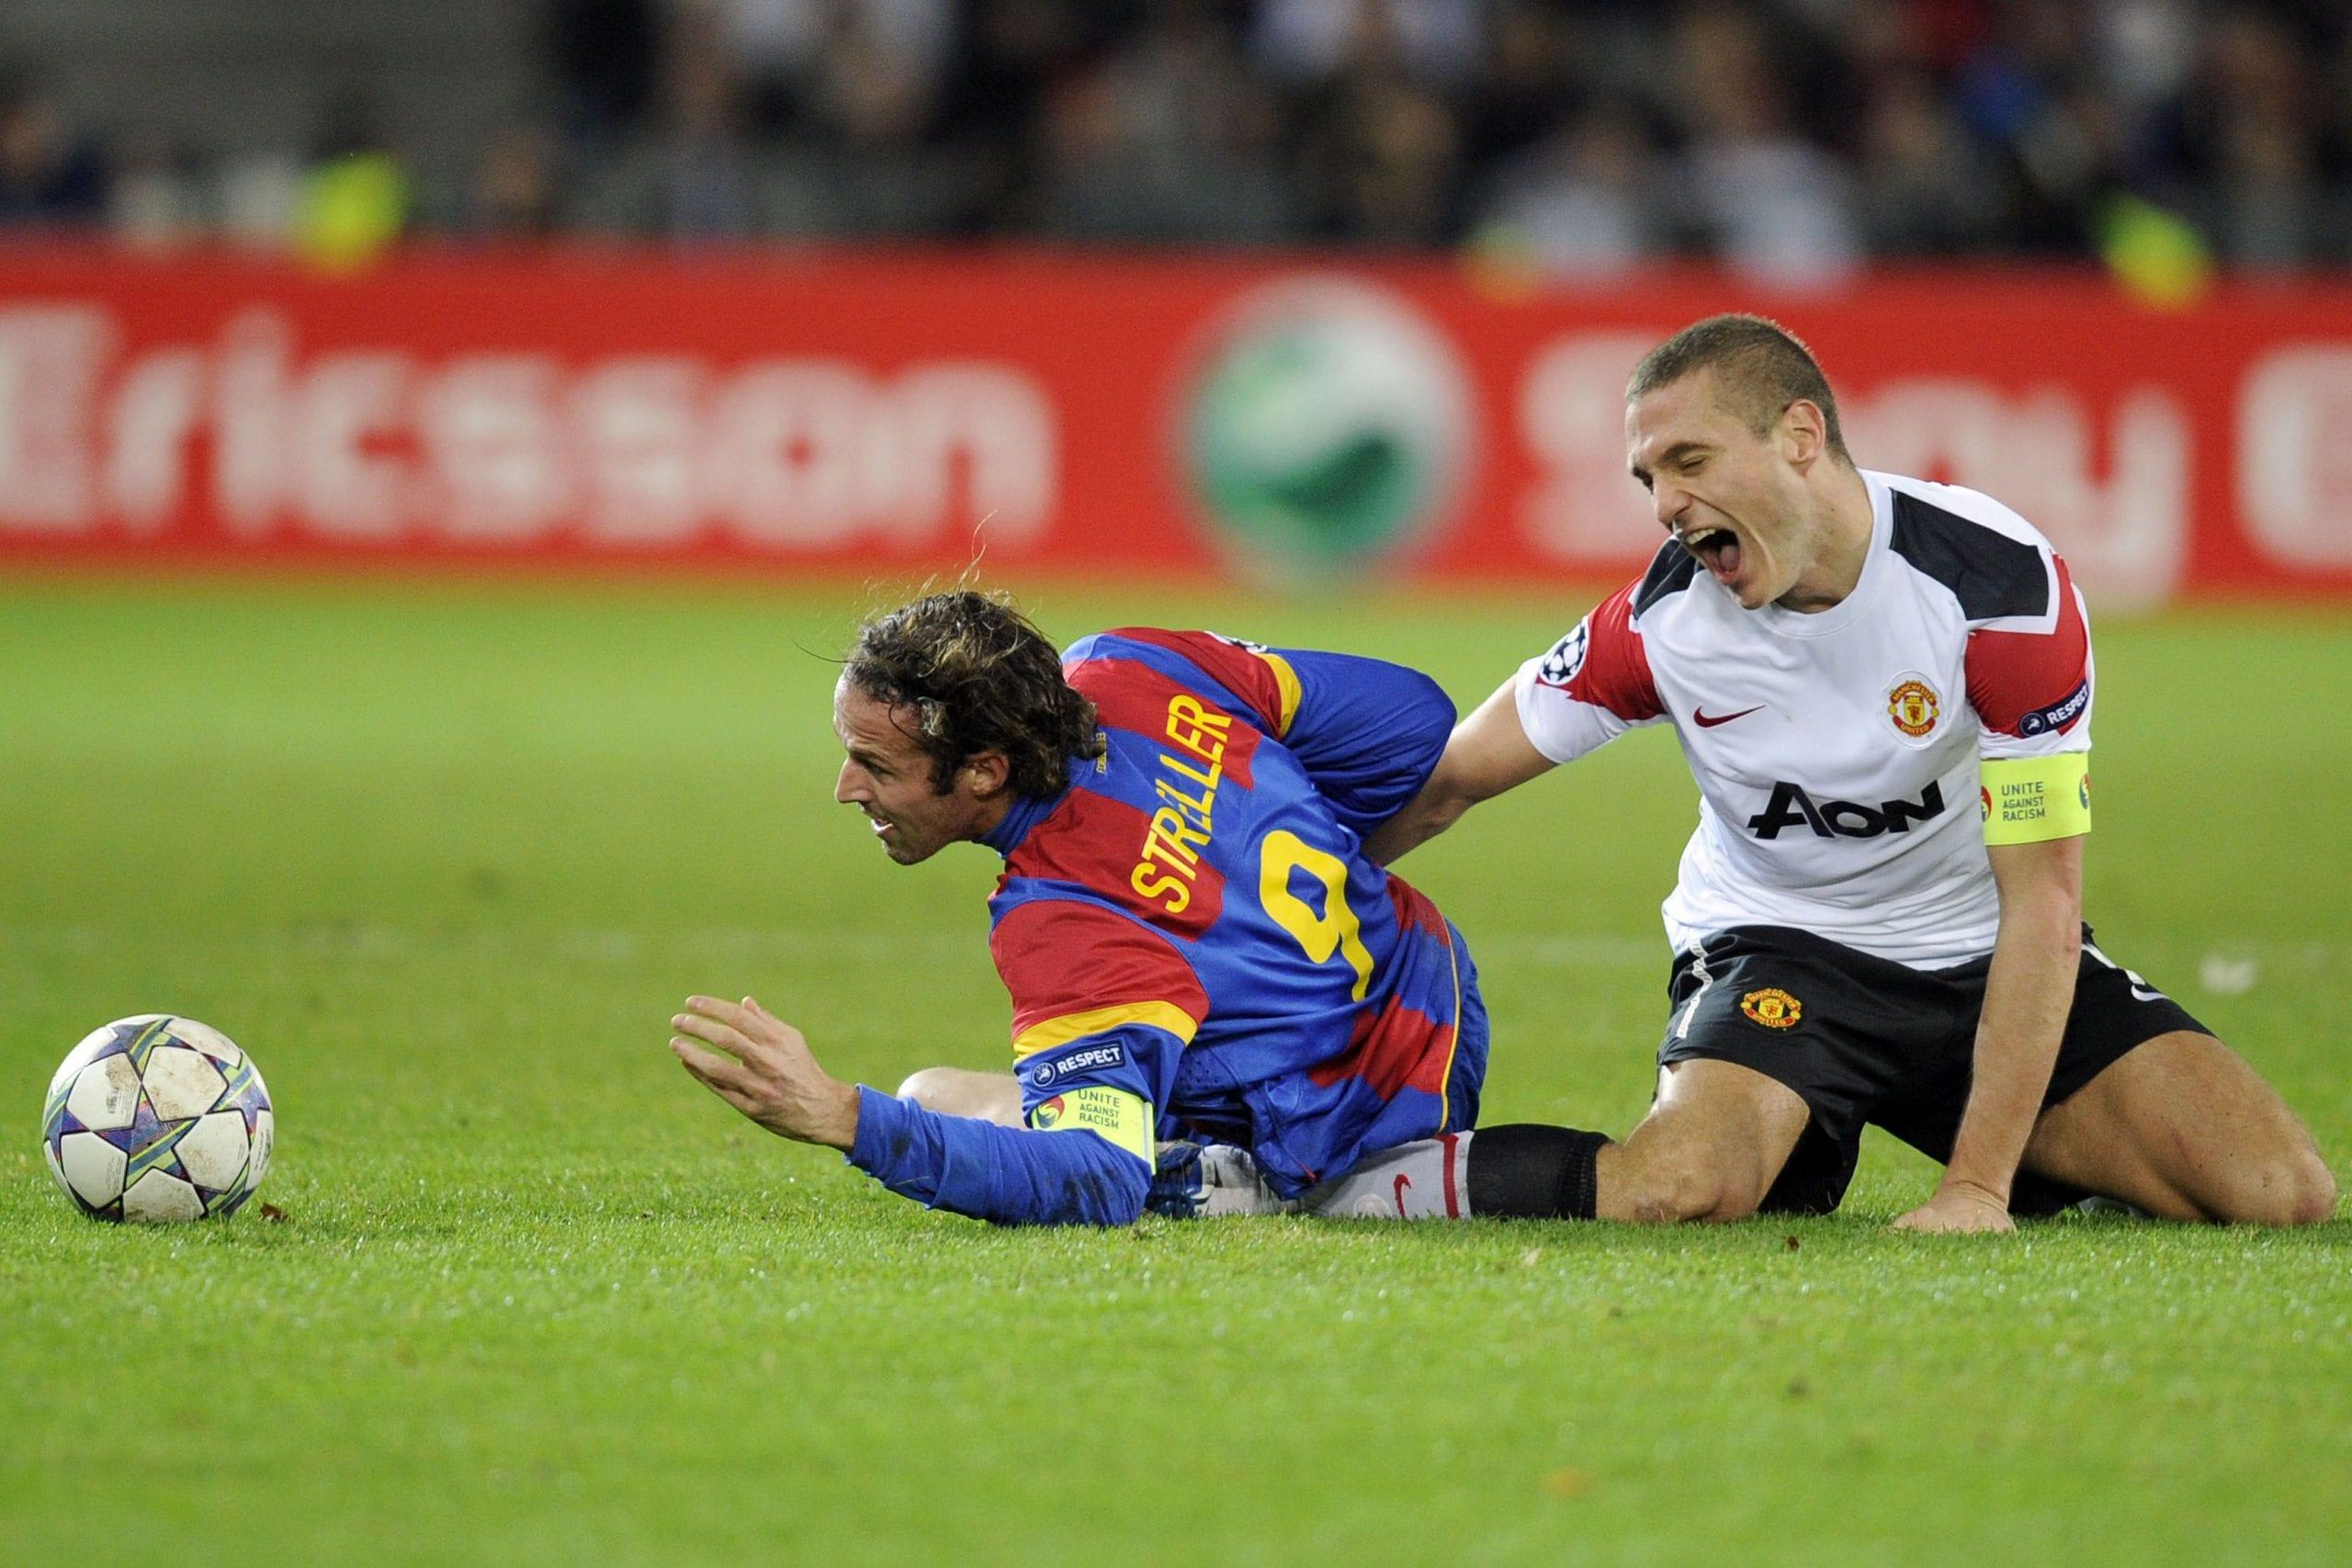 Kecederaan ACL: Bunyi 'Pop!' Di Lutut Yang Ditakuti Pemain Bola Sepak